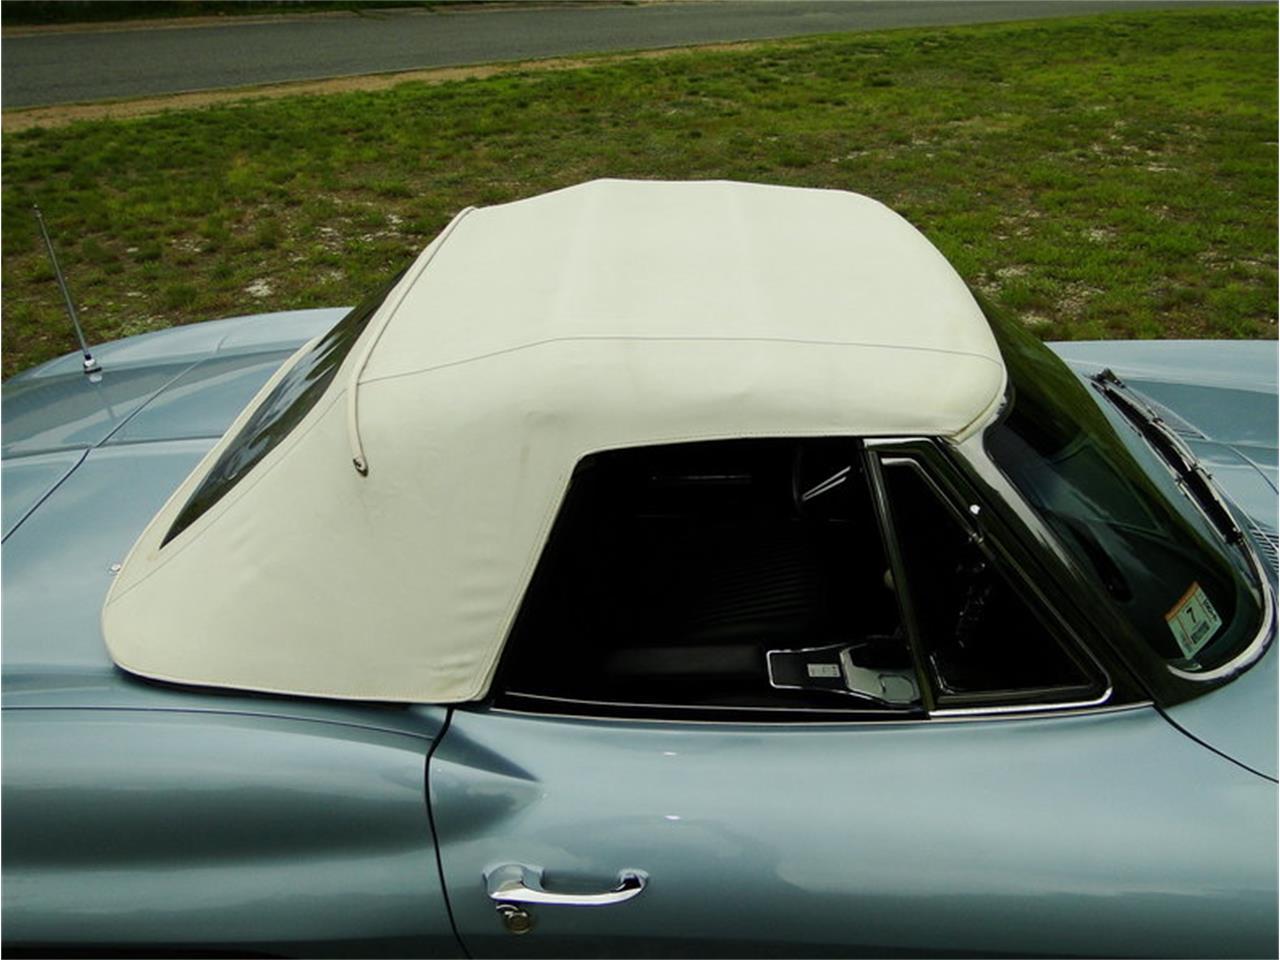 Large Picture of 1964 Corvette - $39,990.00 Offered by Legendary Motors LLC - LDZM